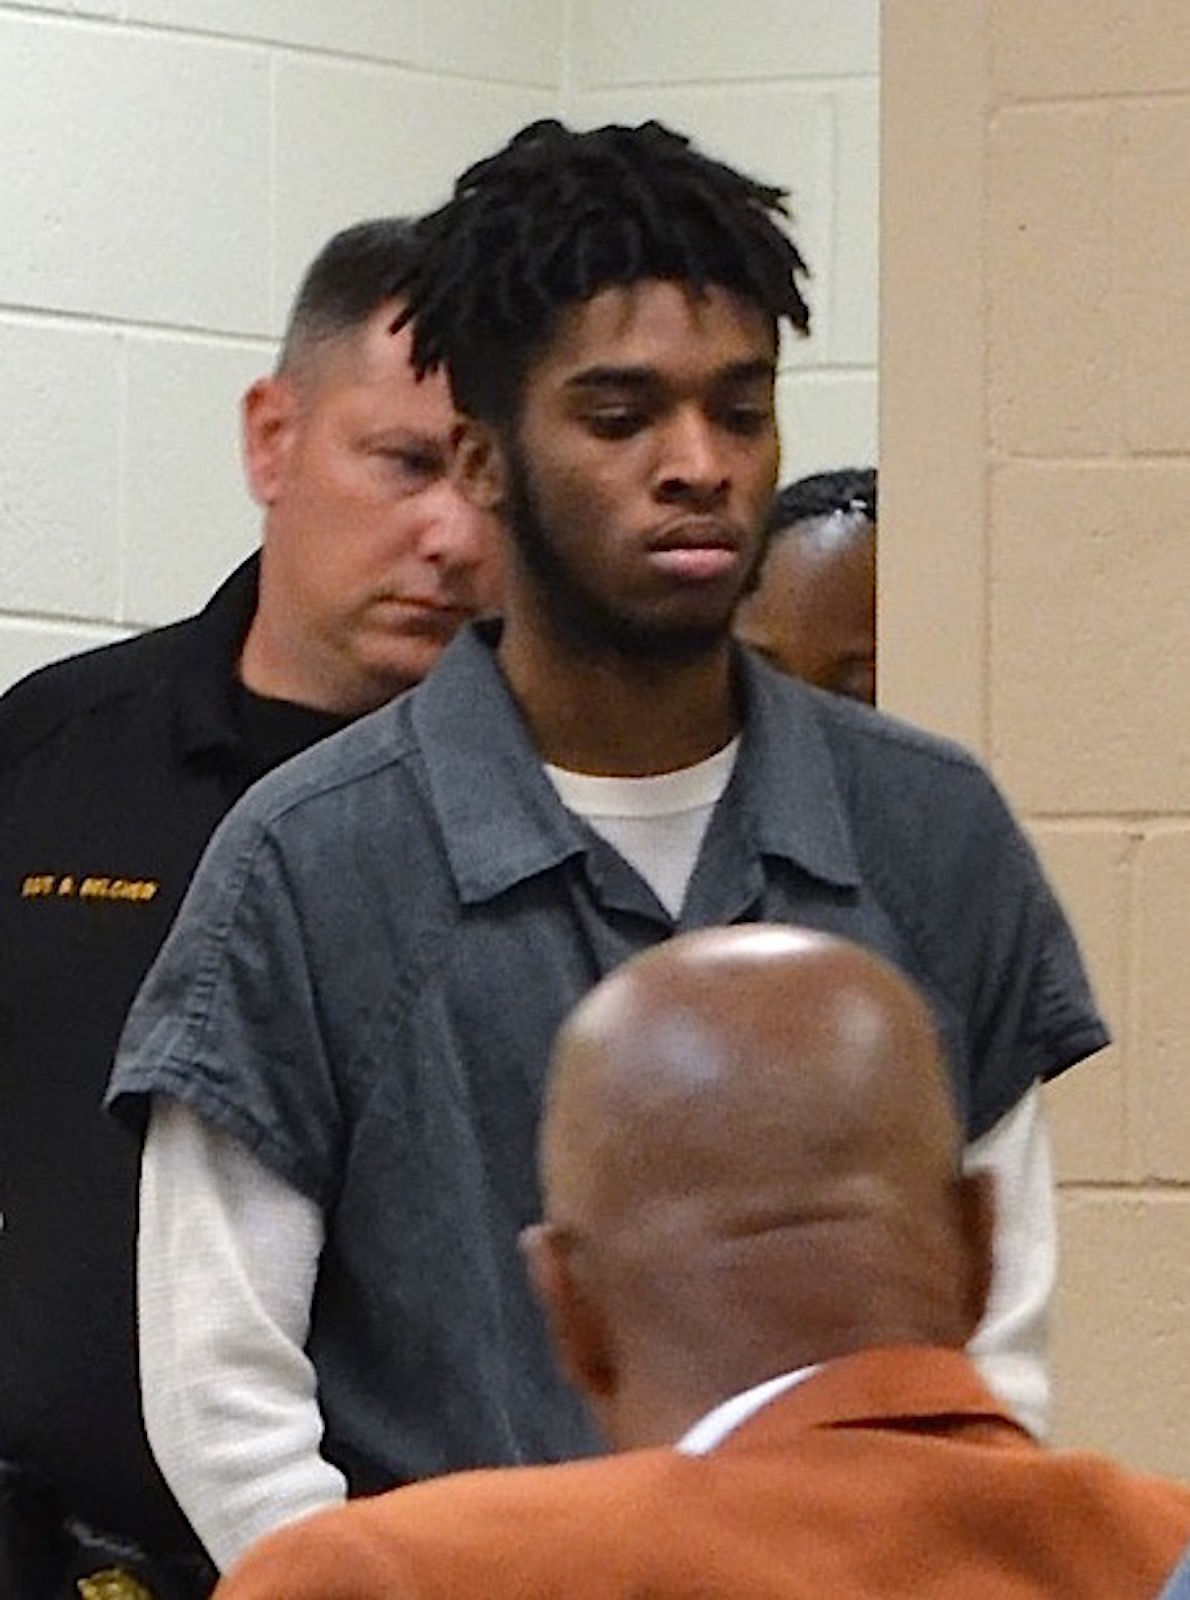 Bond for accused killer of Stockbridge student to remain at $500K